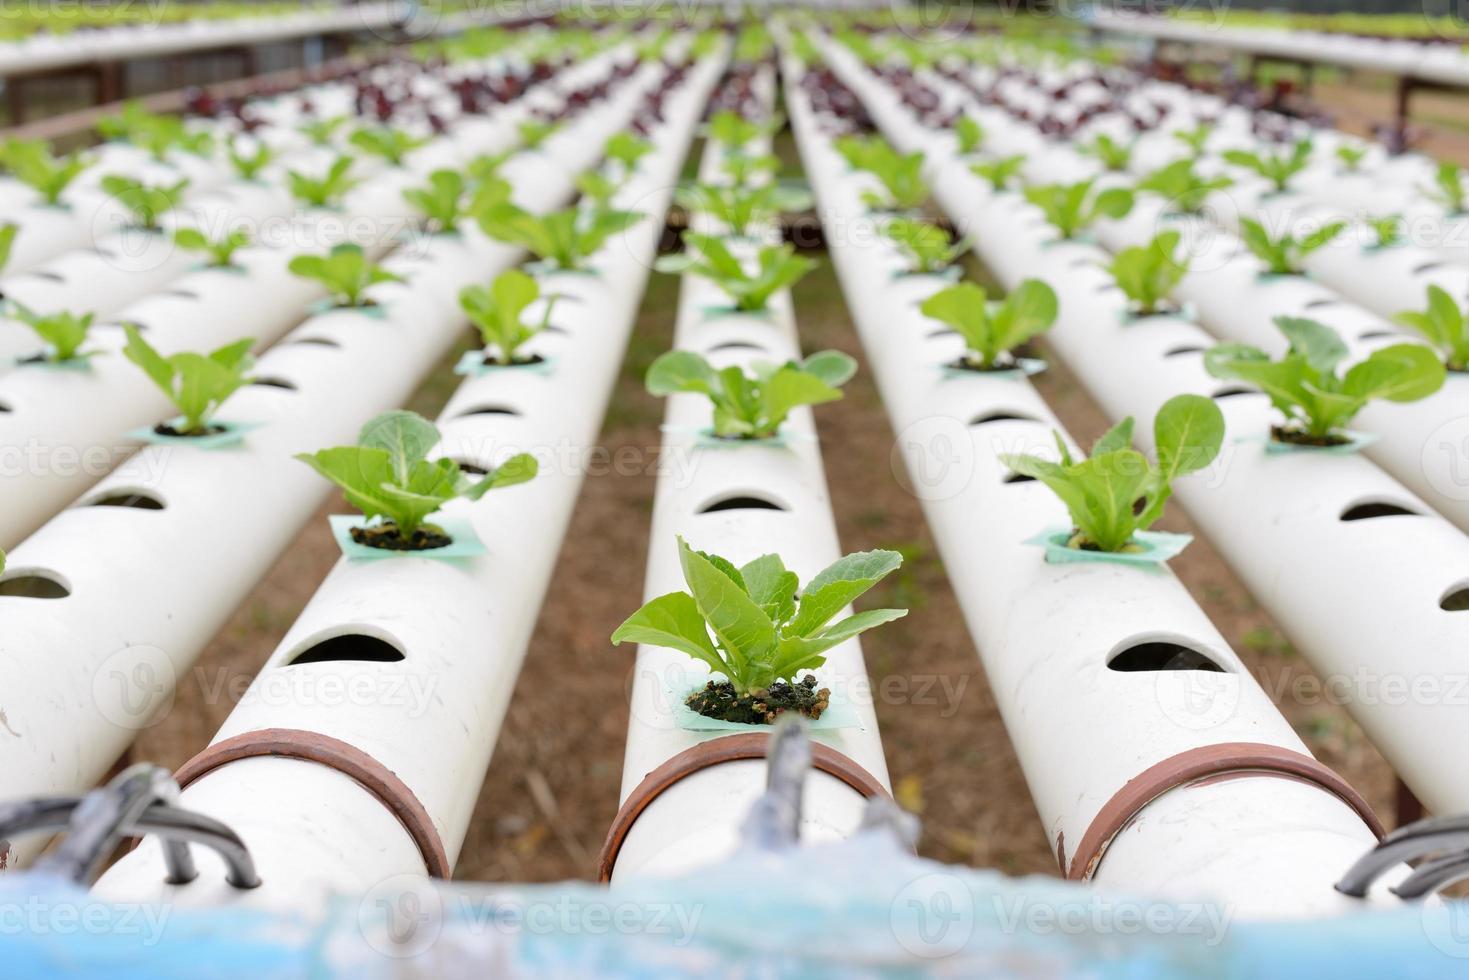 Hydroponic vegetable plantation photo